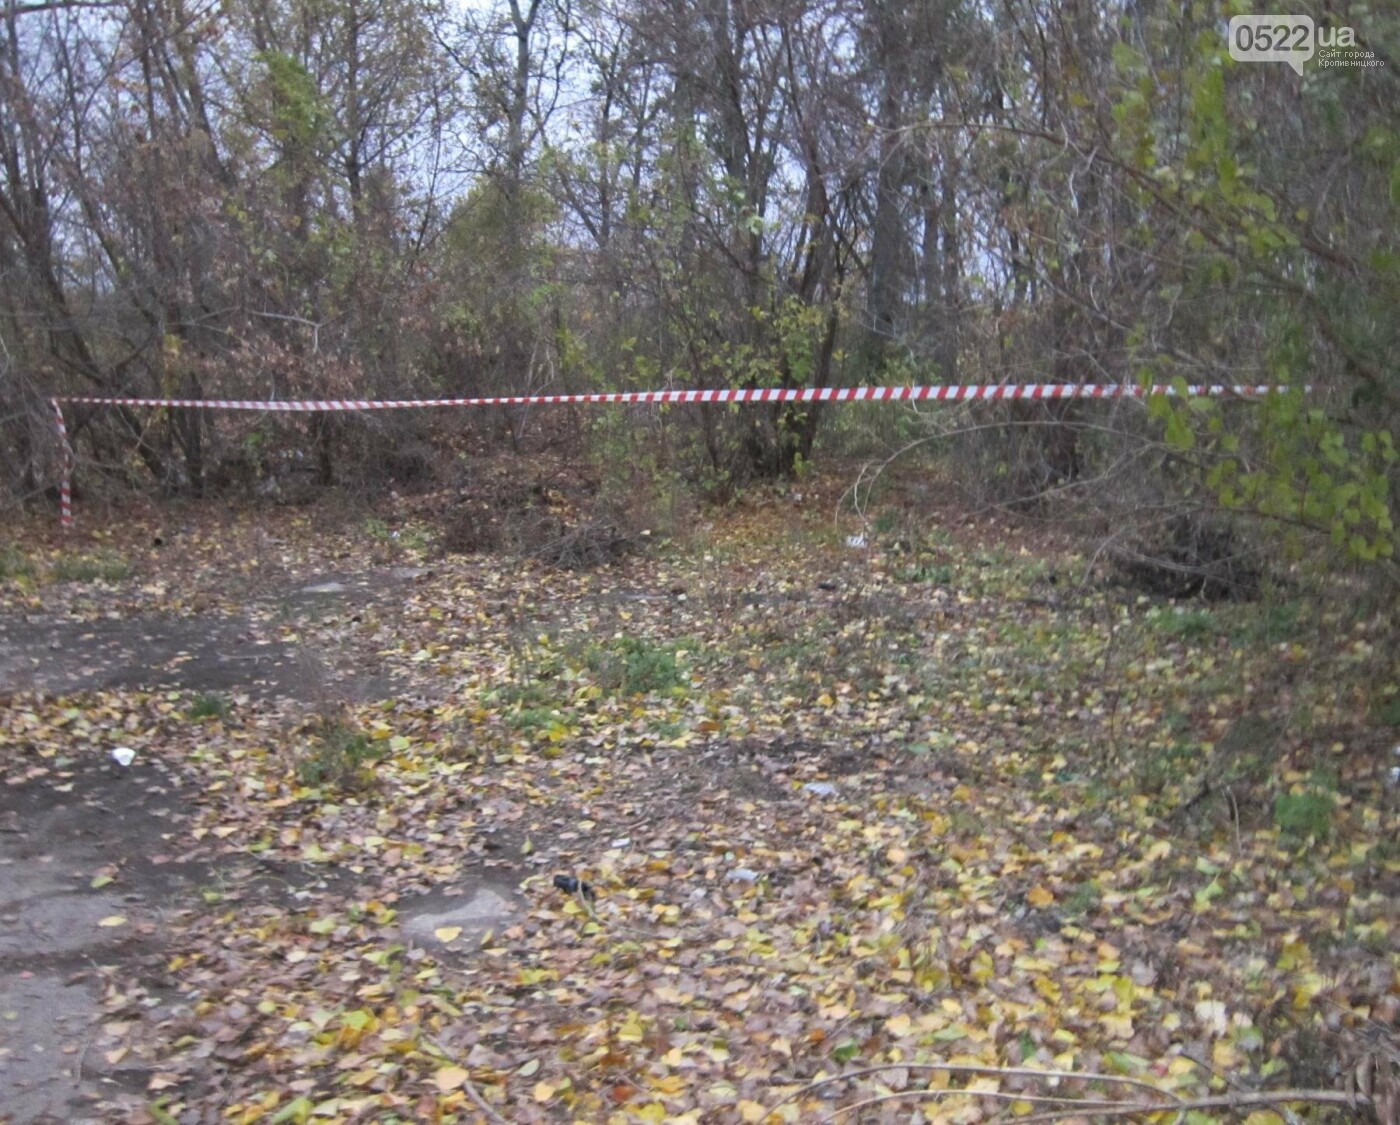 В Кропивницком изнасиловали девушку. ФОТО, фото-1